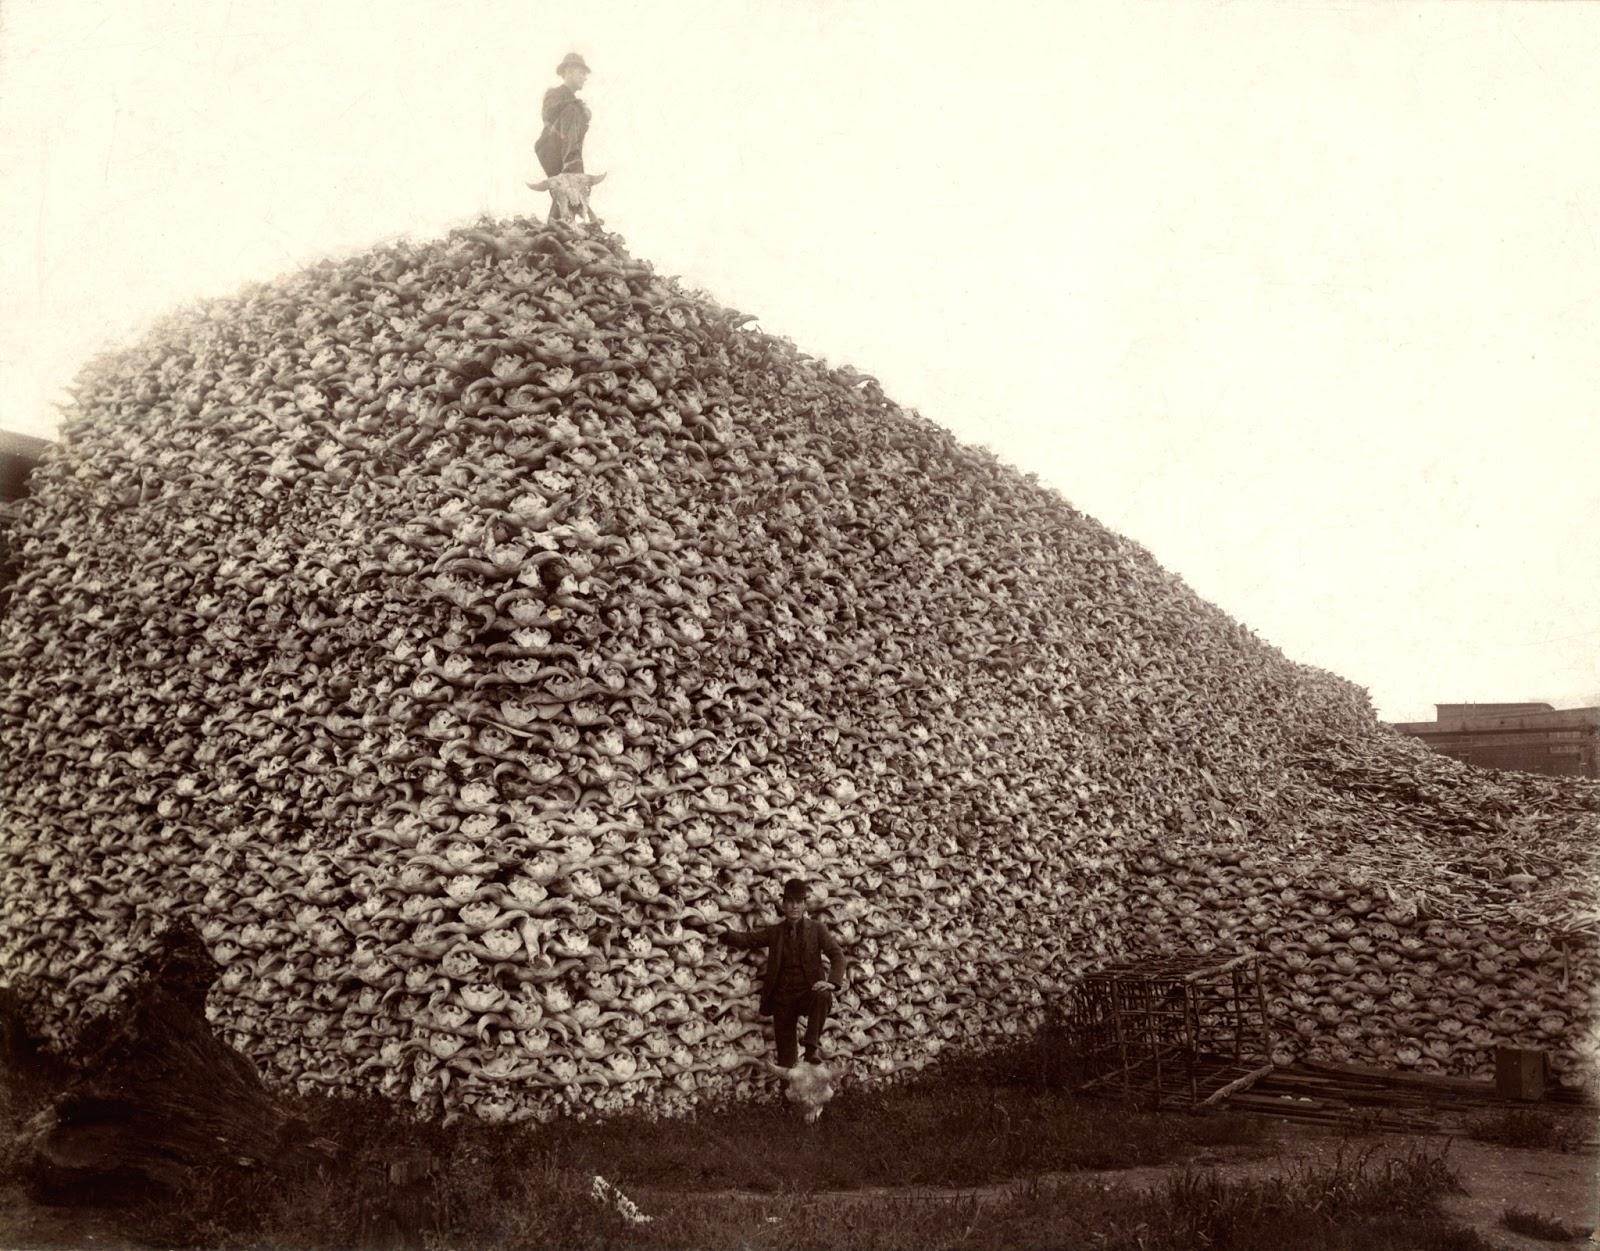 American bison skulls